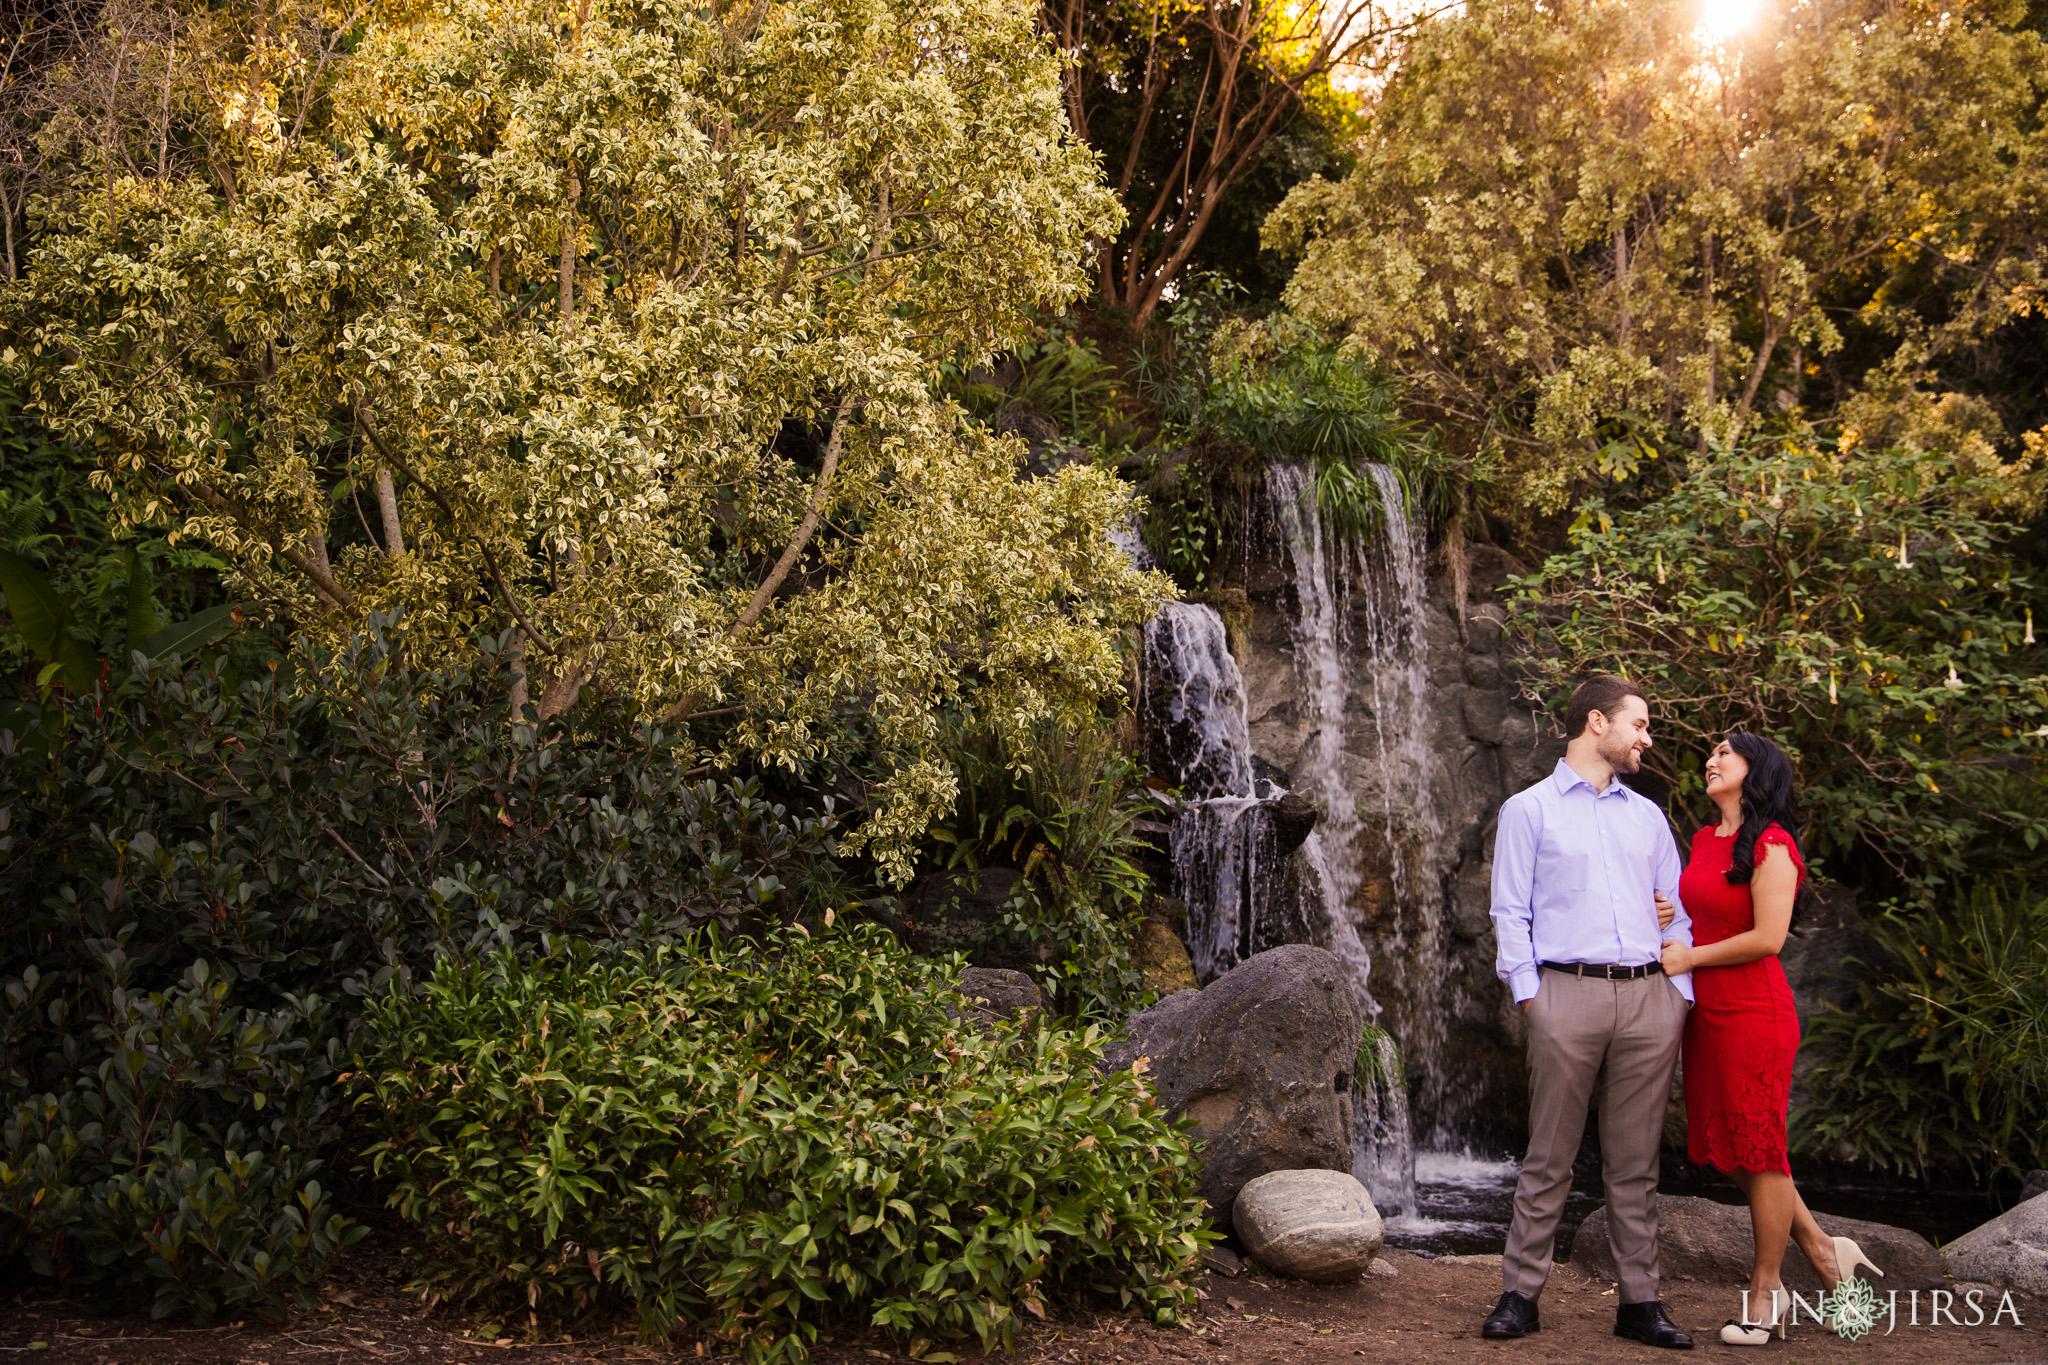 zbf los angeles arboretum engagement photography